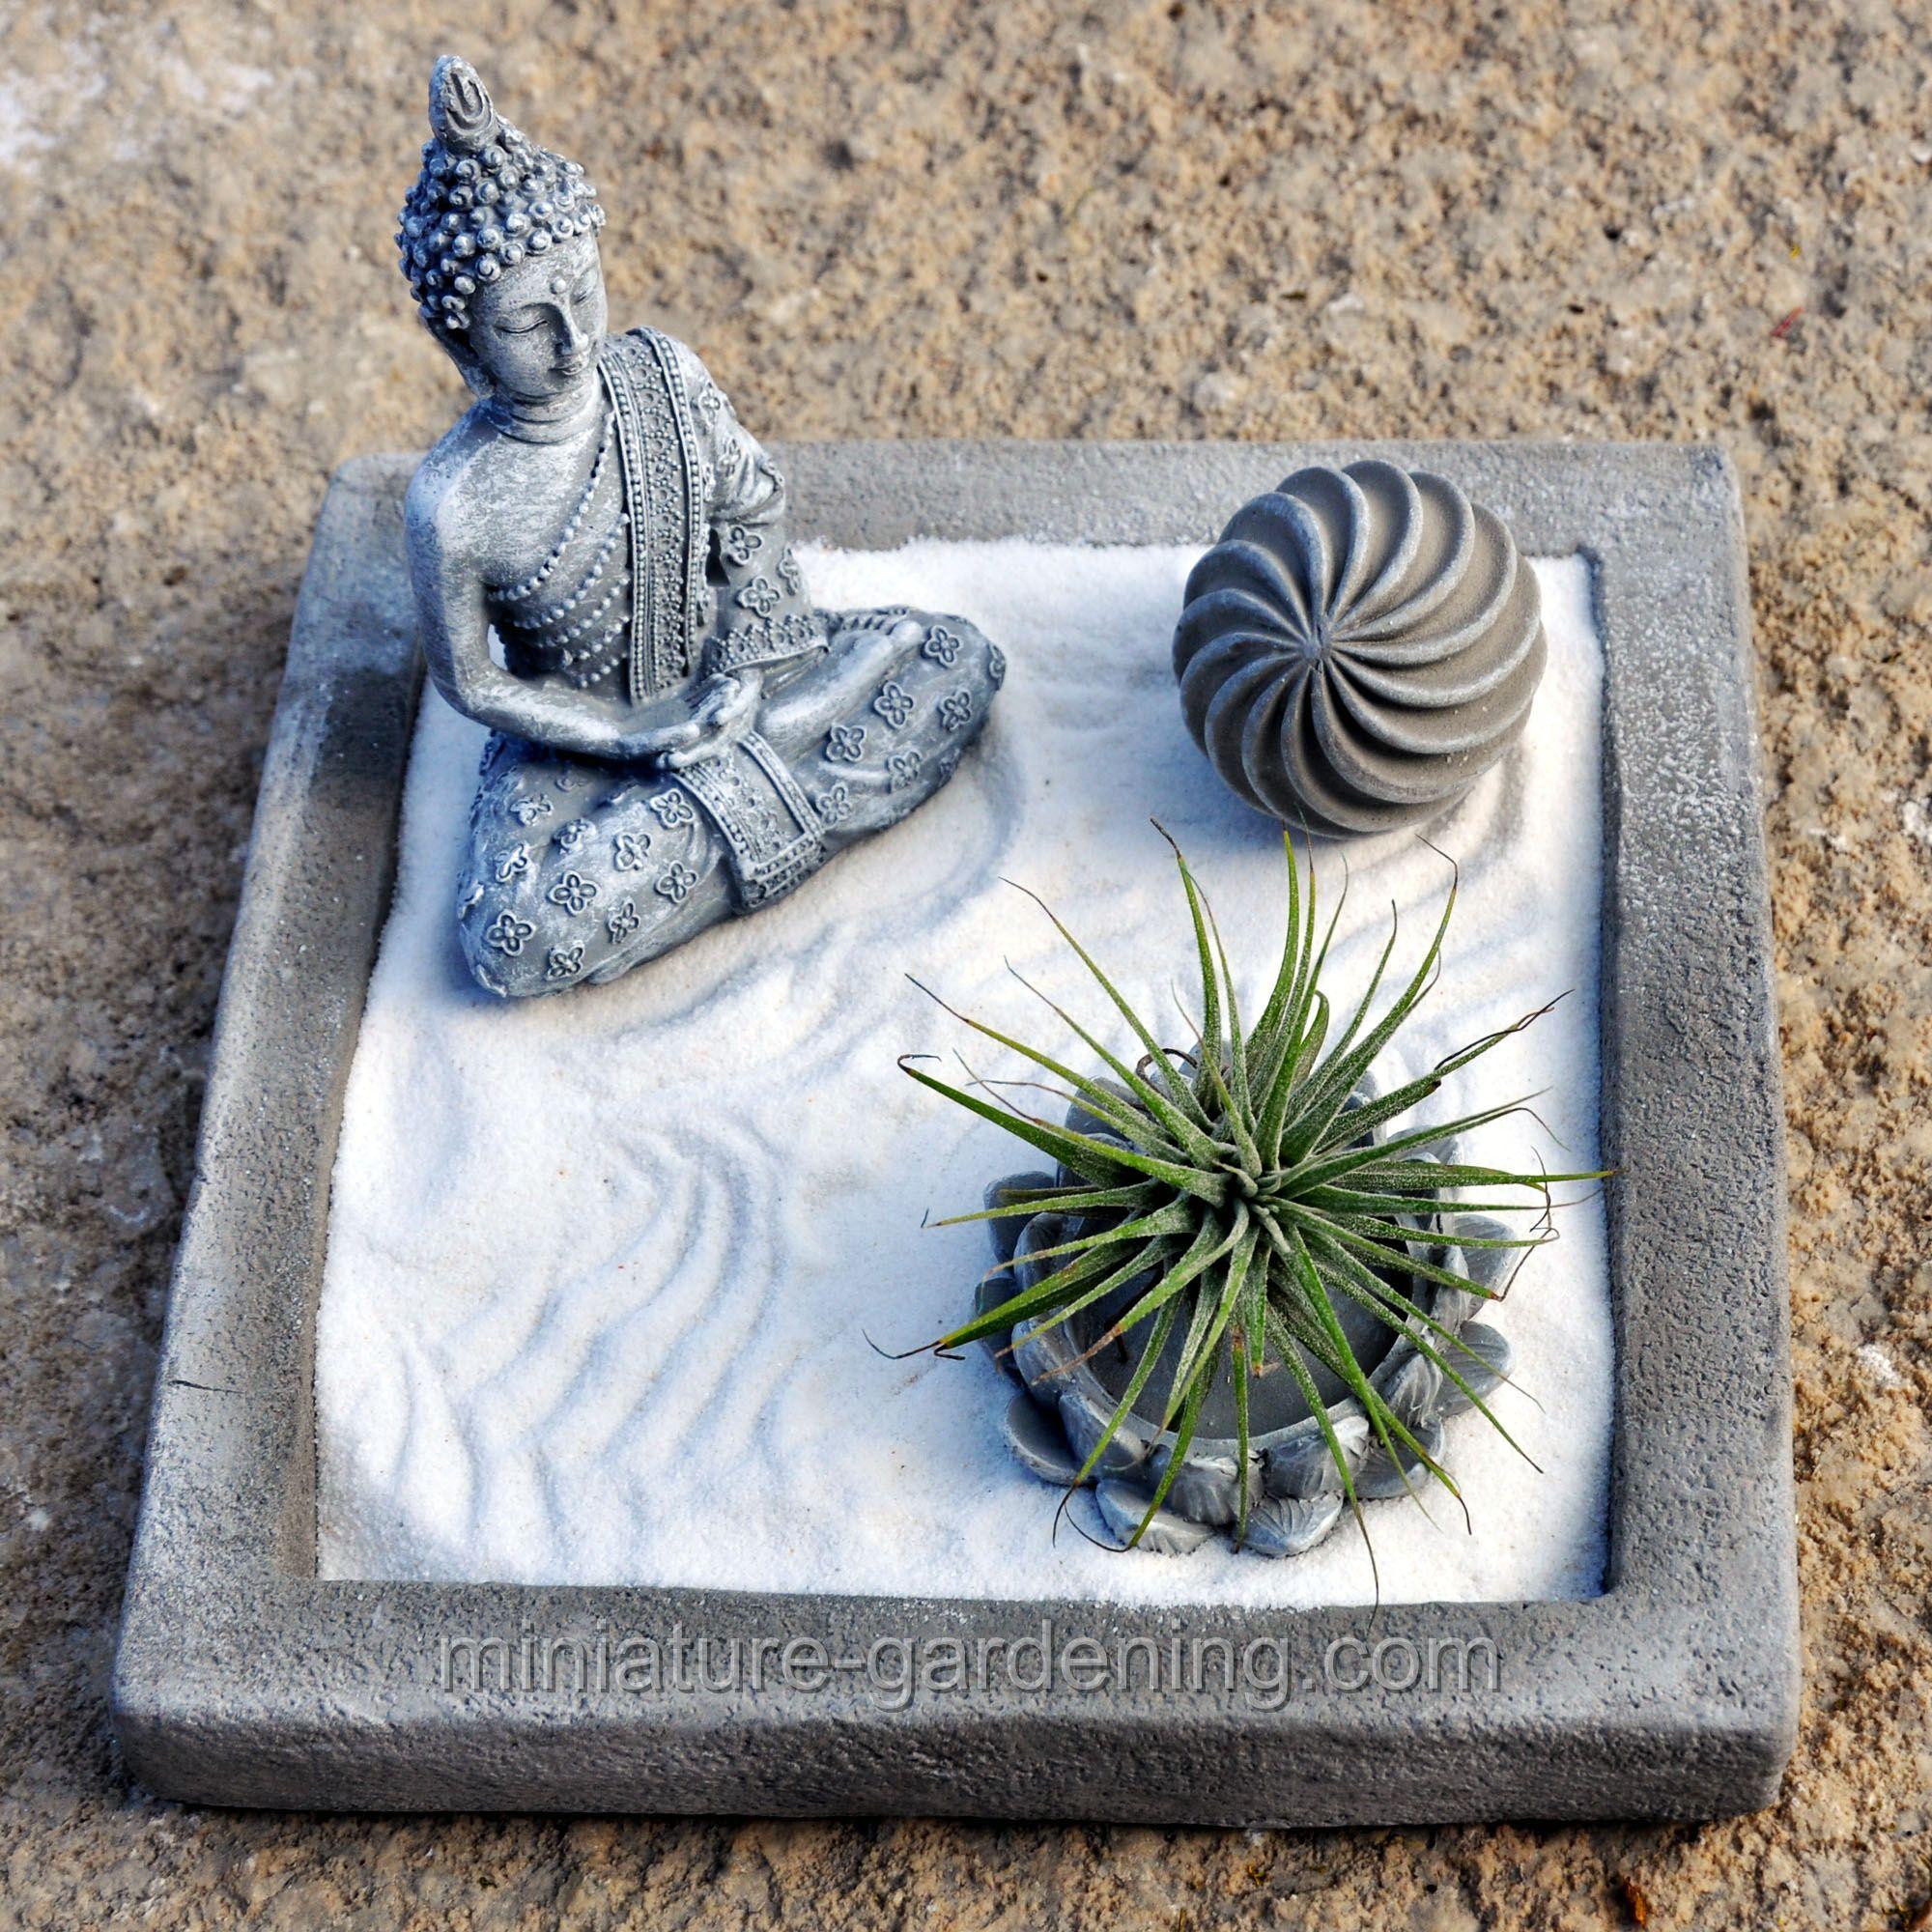 Miniature Gardening Square Cement Zen Plate 11 99 Accessories